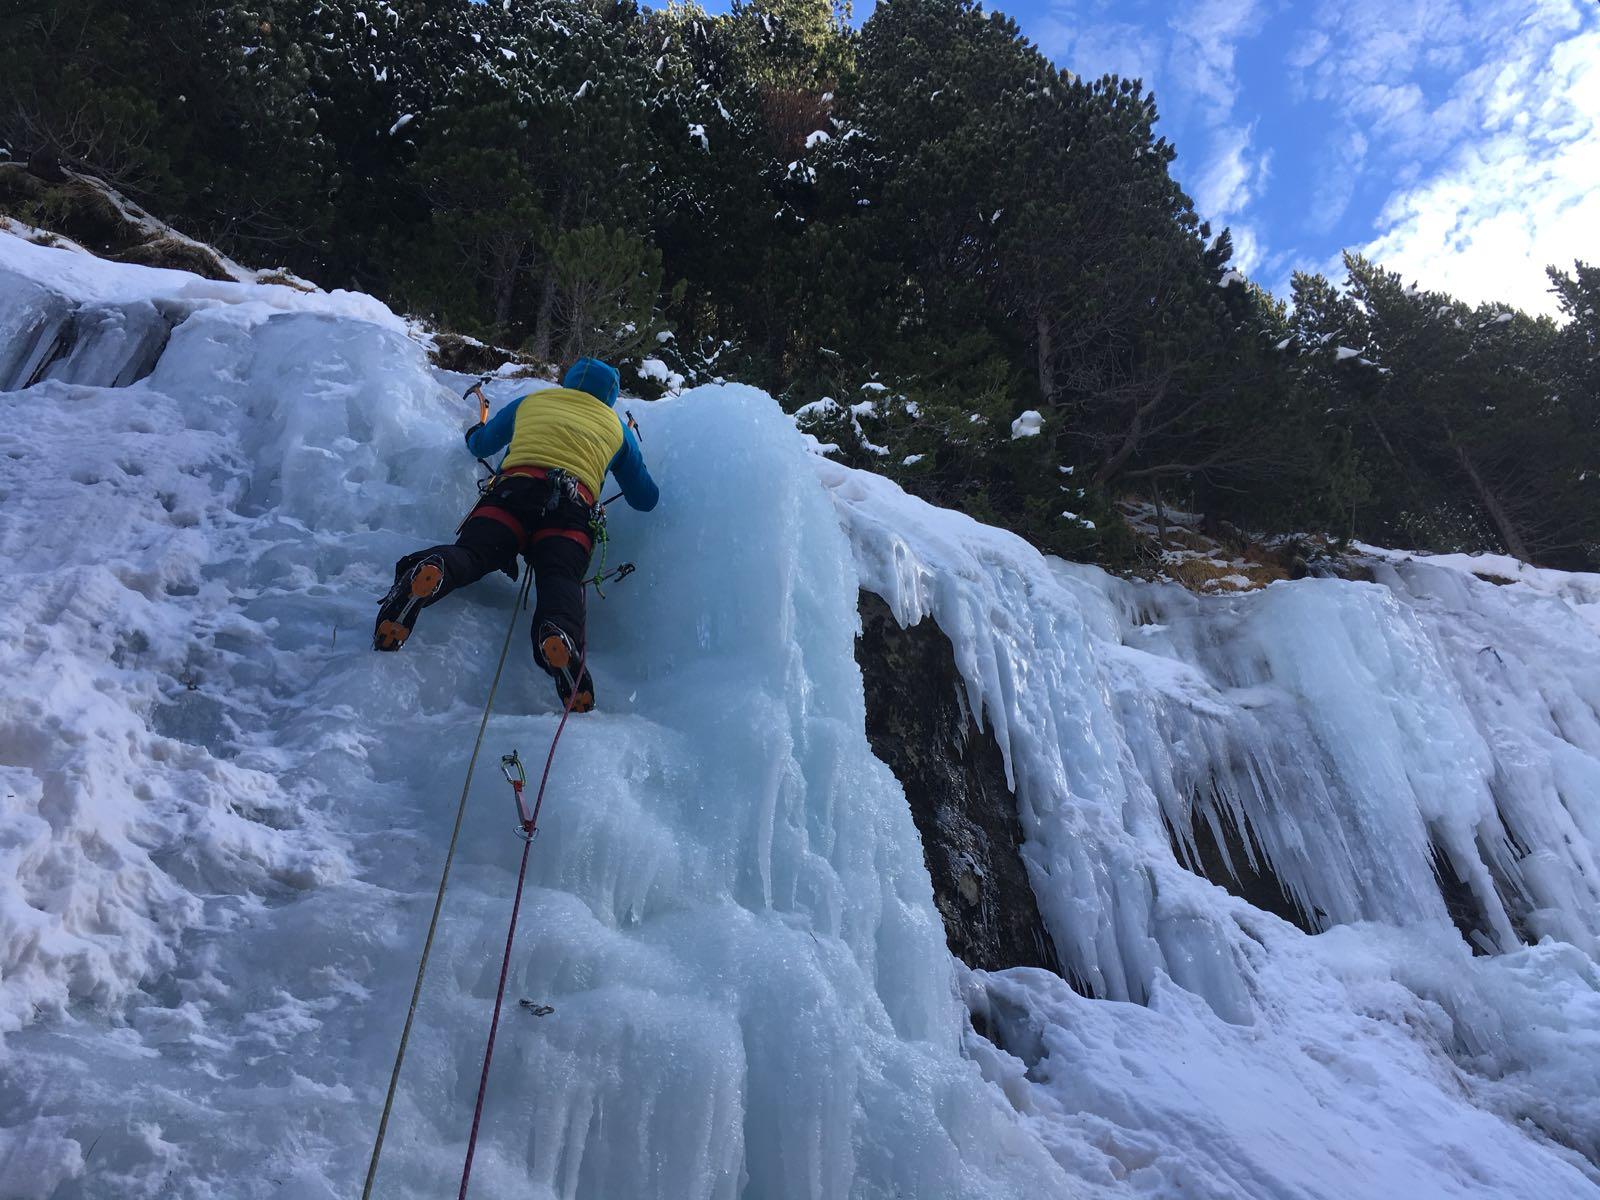 Curso de escalada en hielo (Sierra de Gredos)